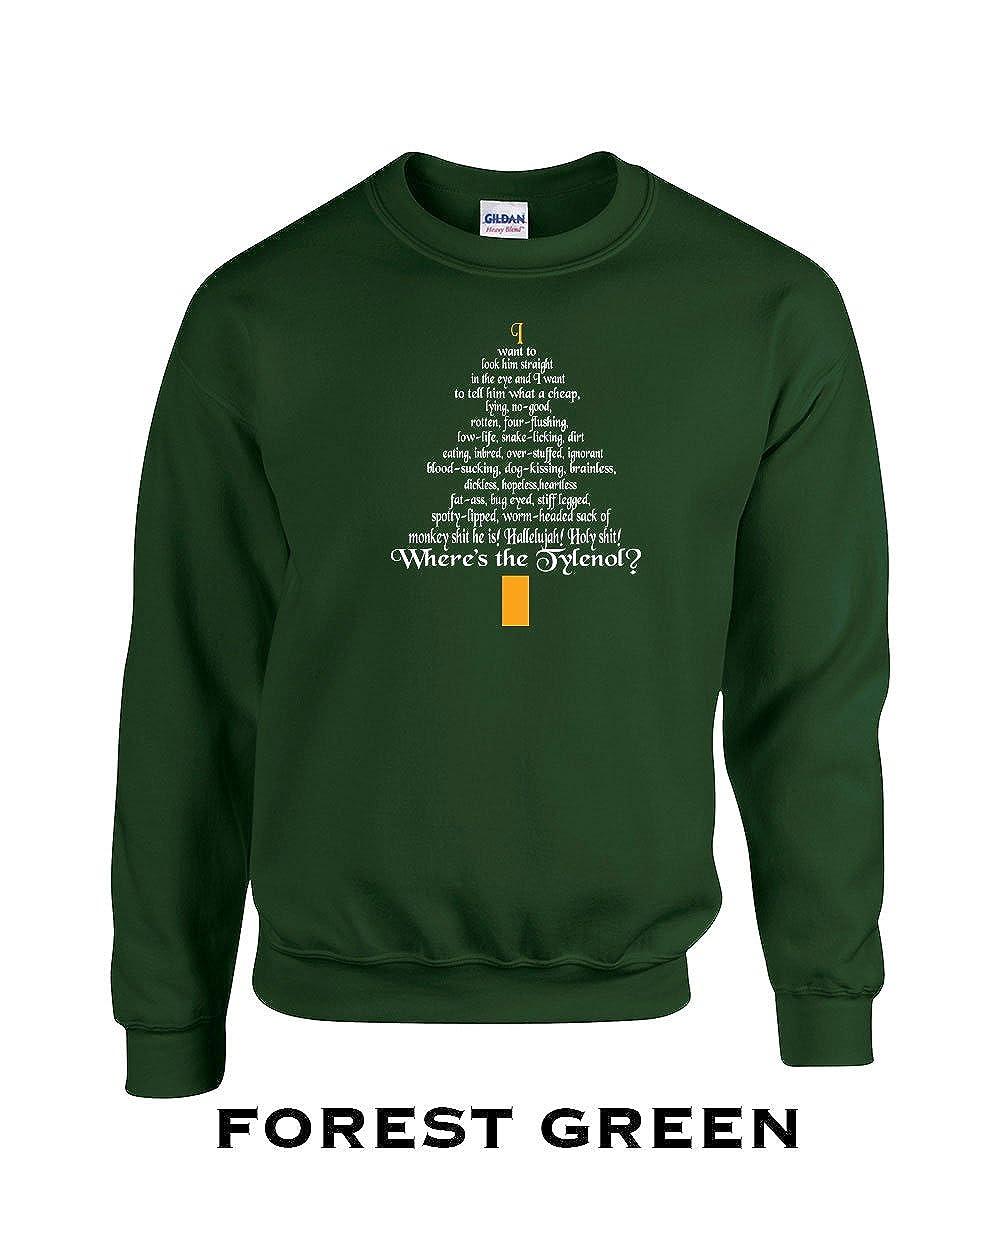 398 Clark Rant Funny Adult Crew Sweatshirt